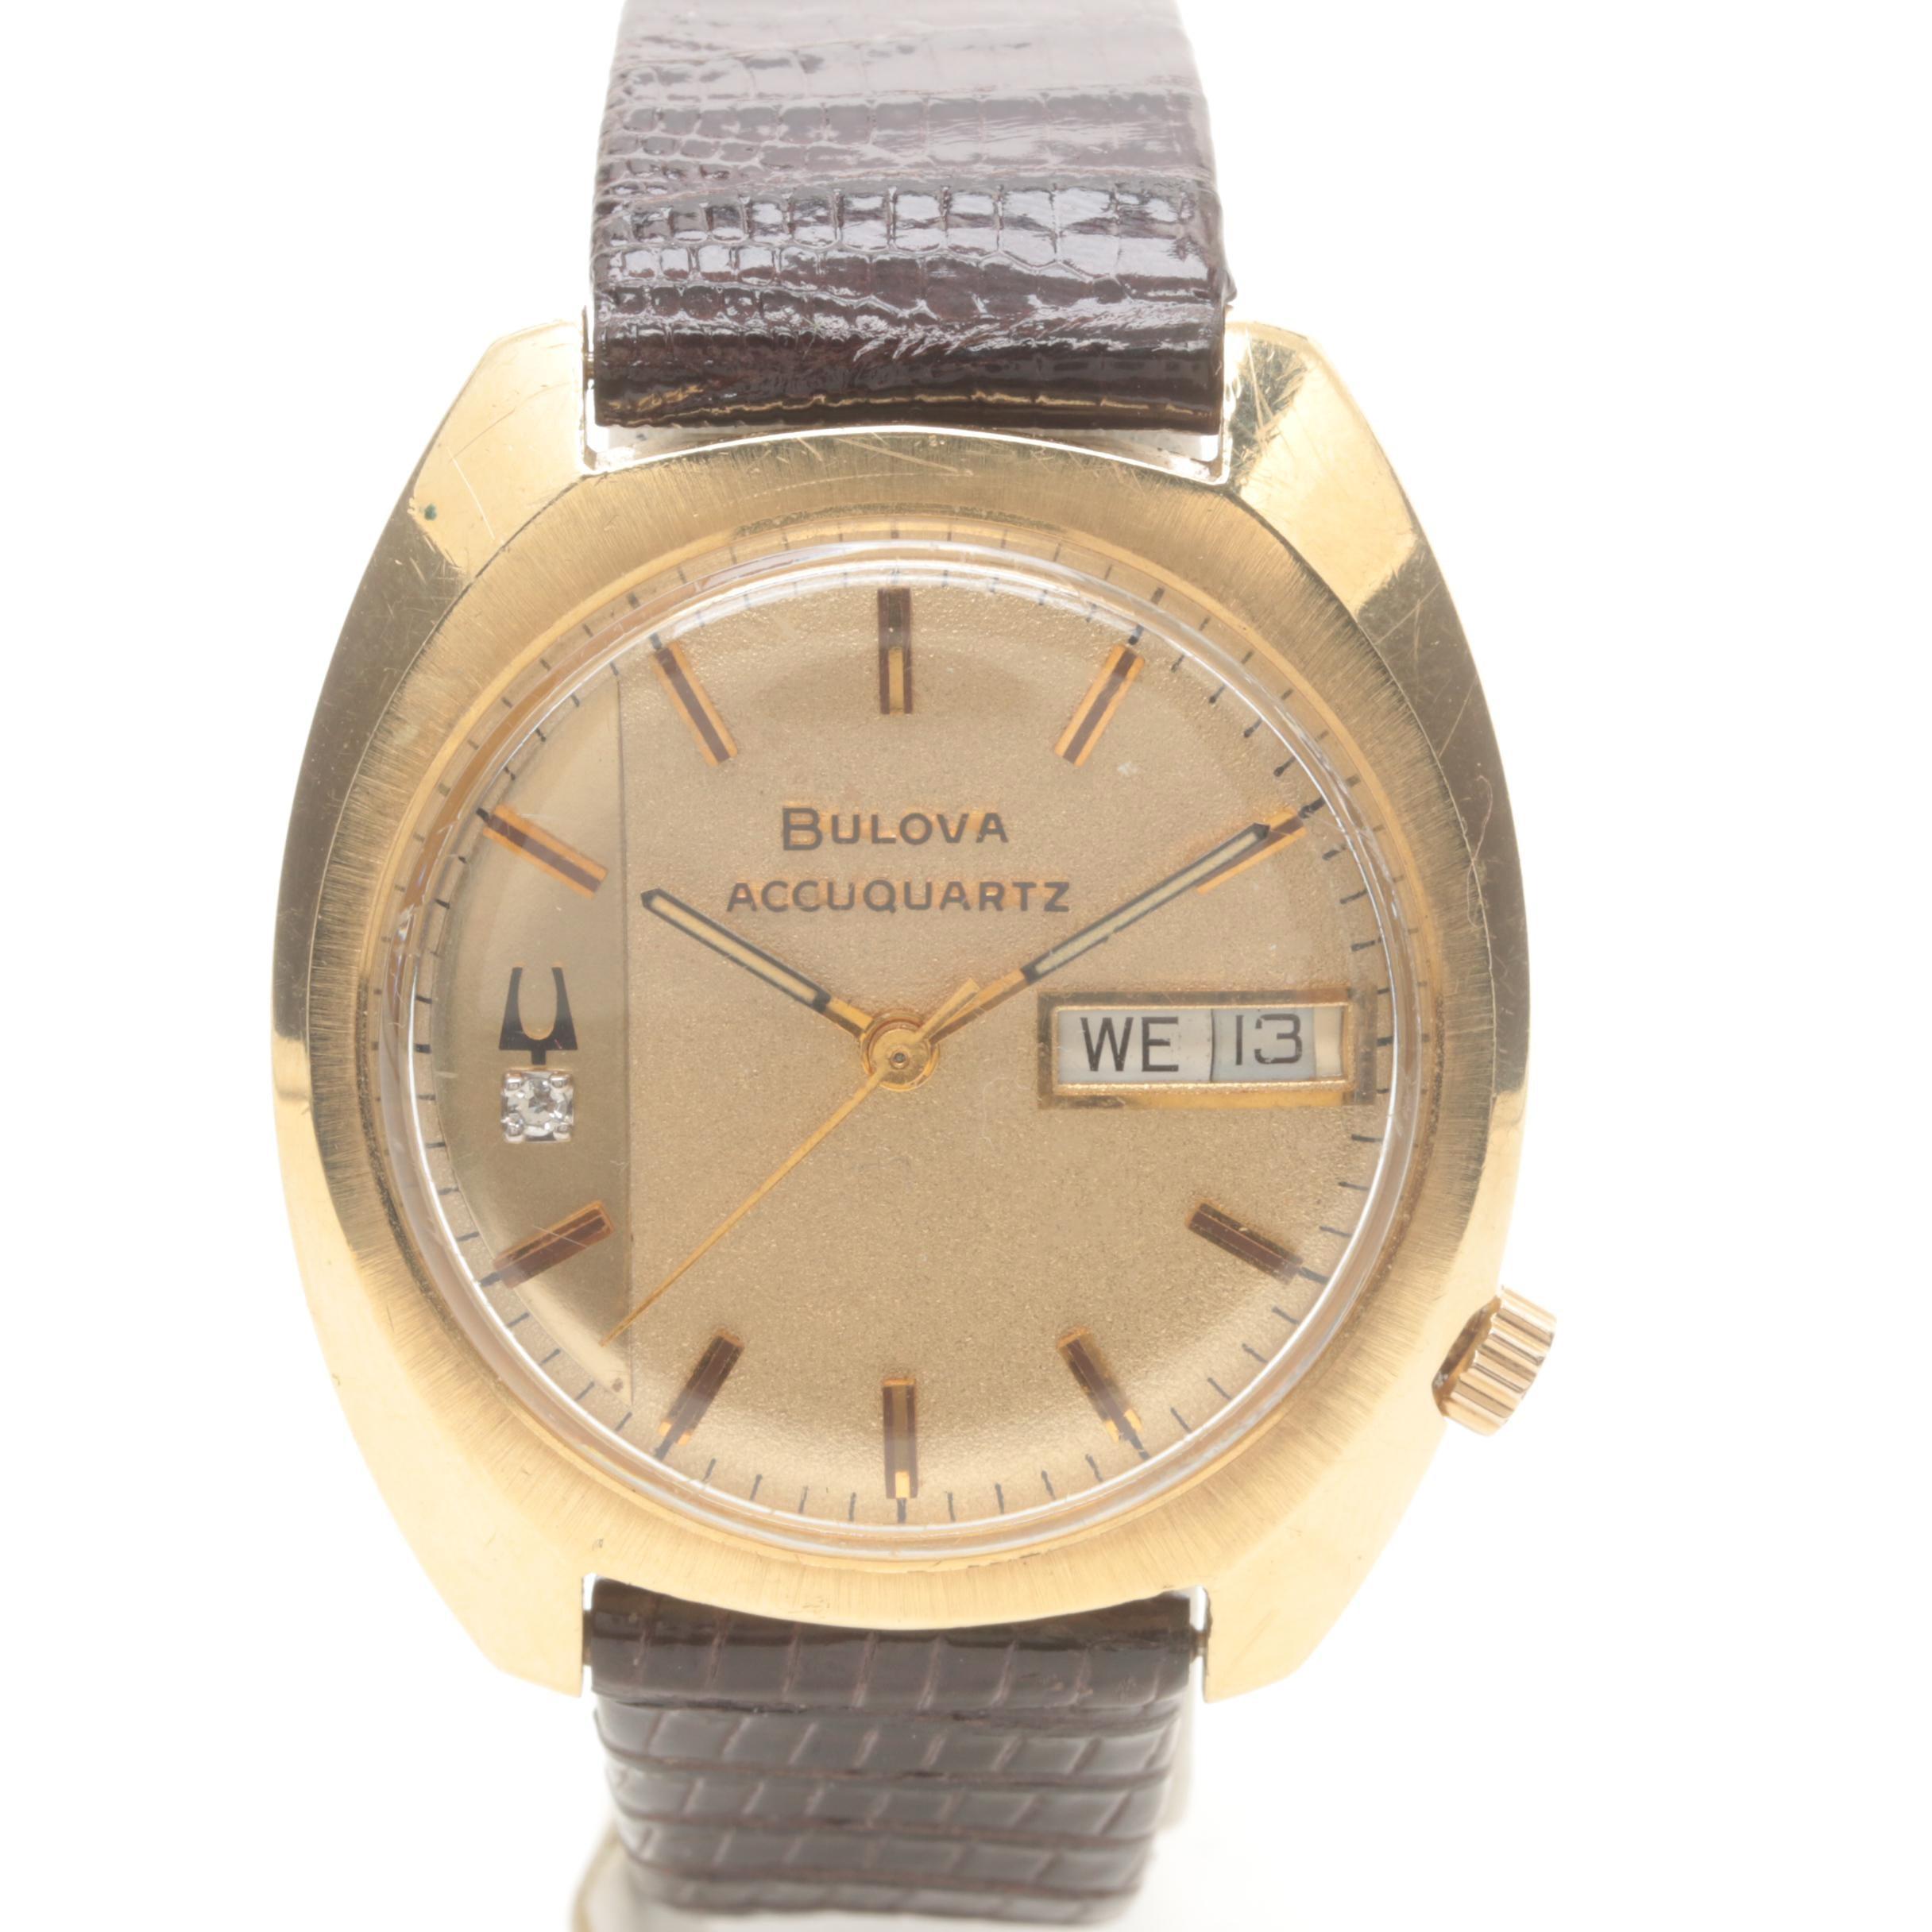 Bulova 14K Yellow Gold and Stainless Steel Diamond Wristwatch